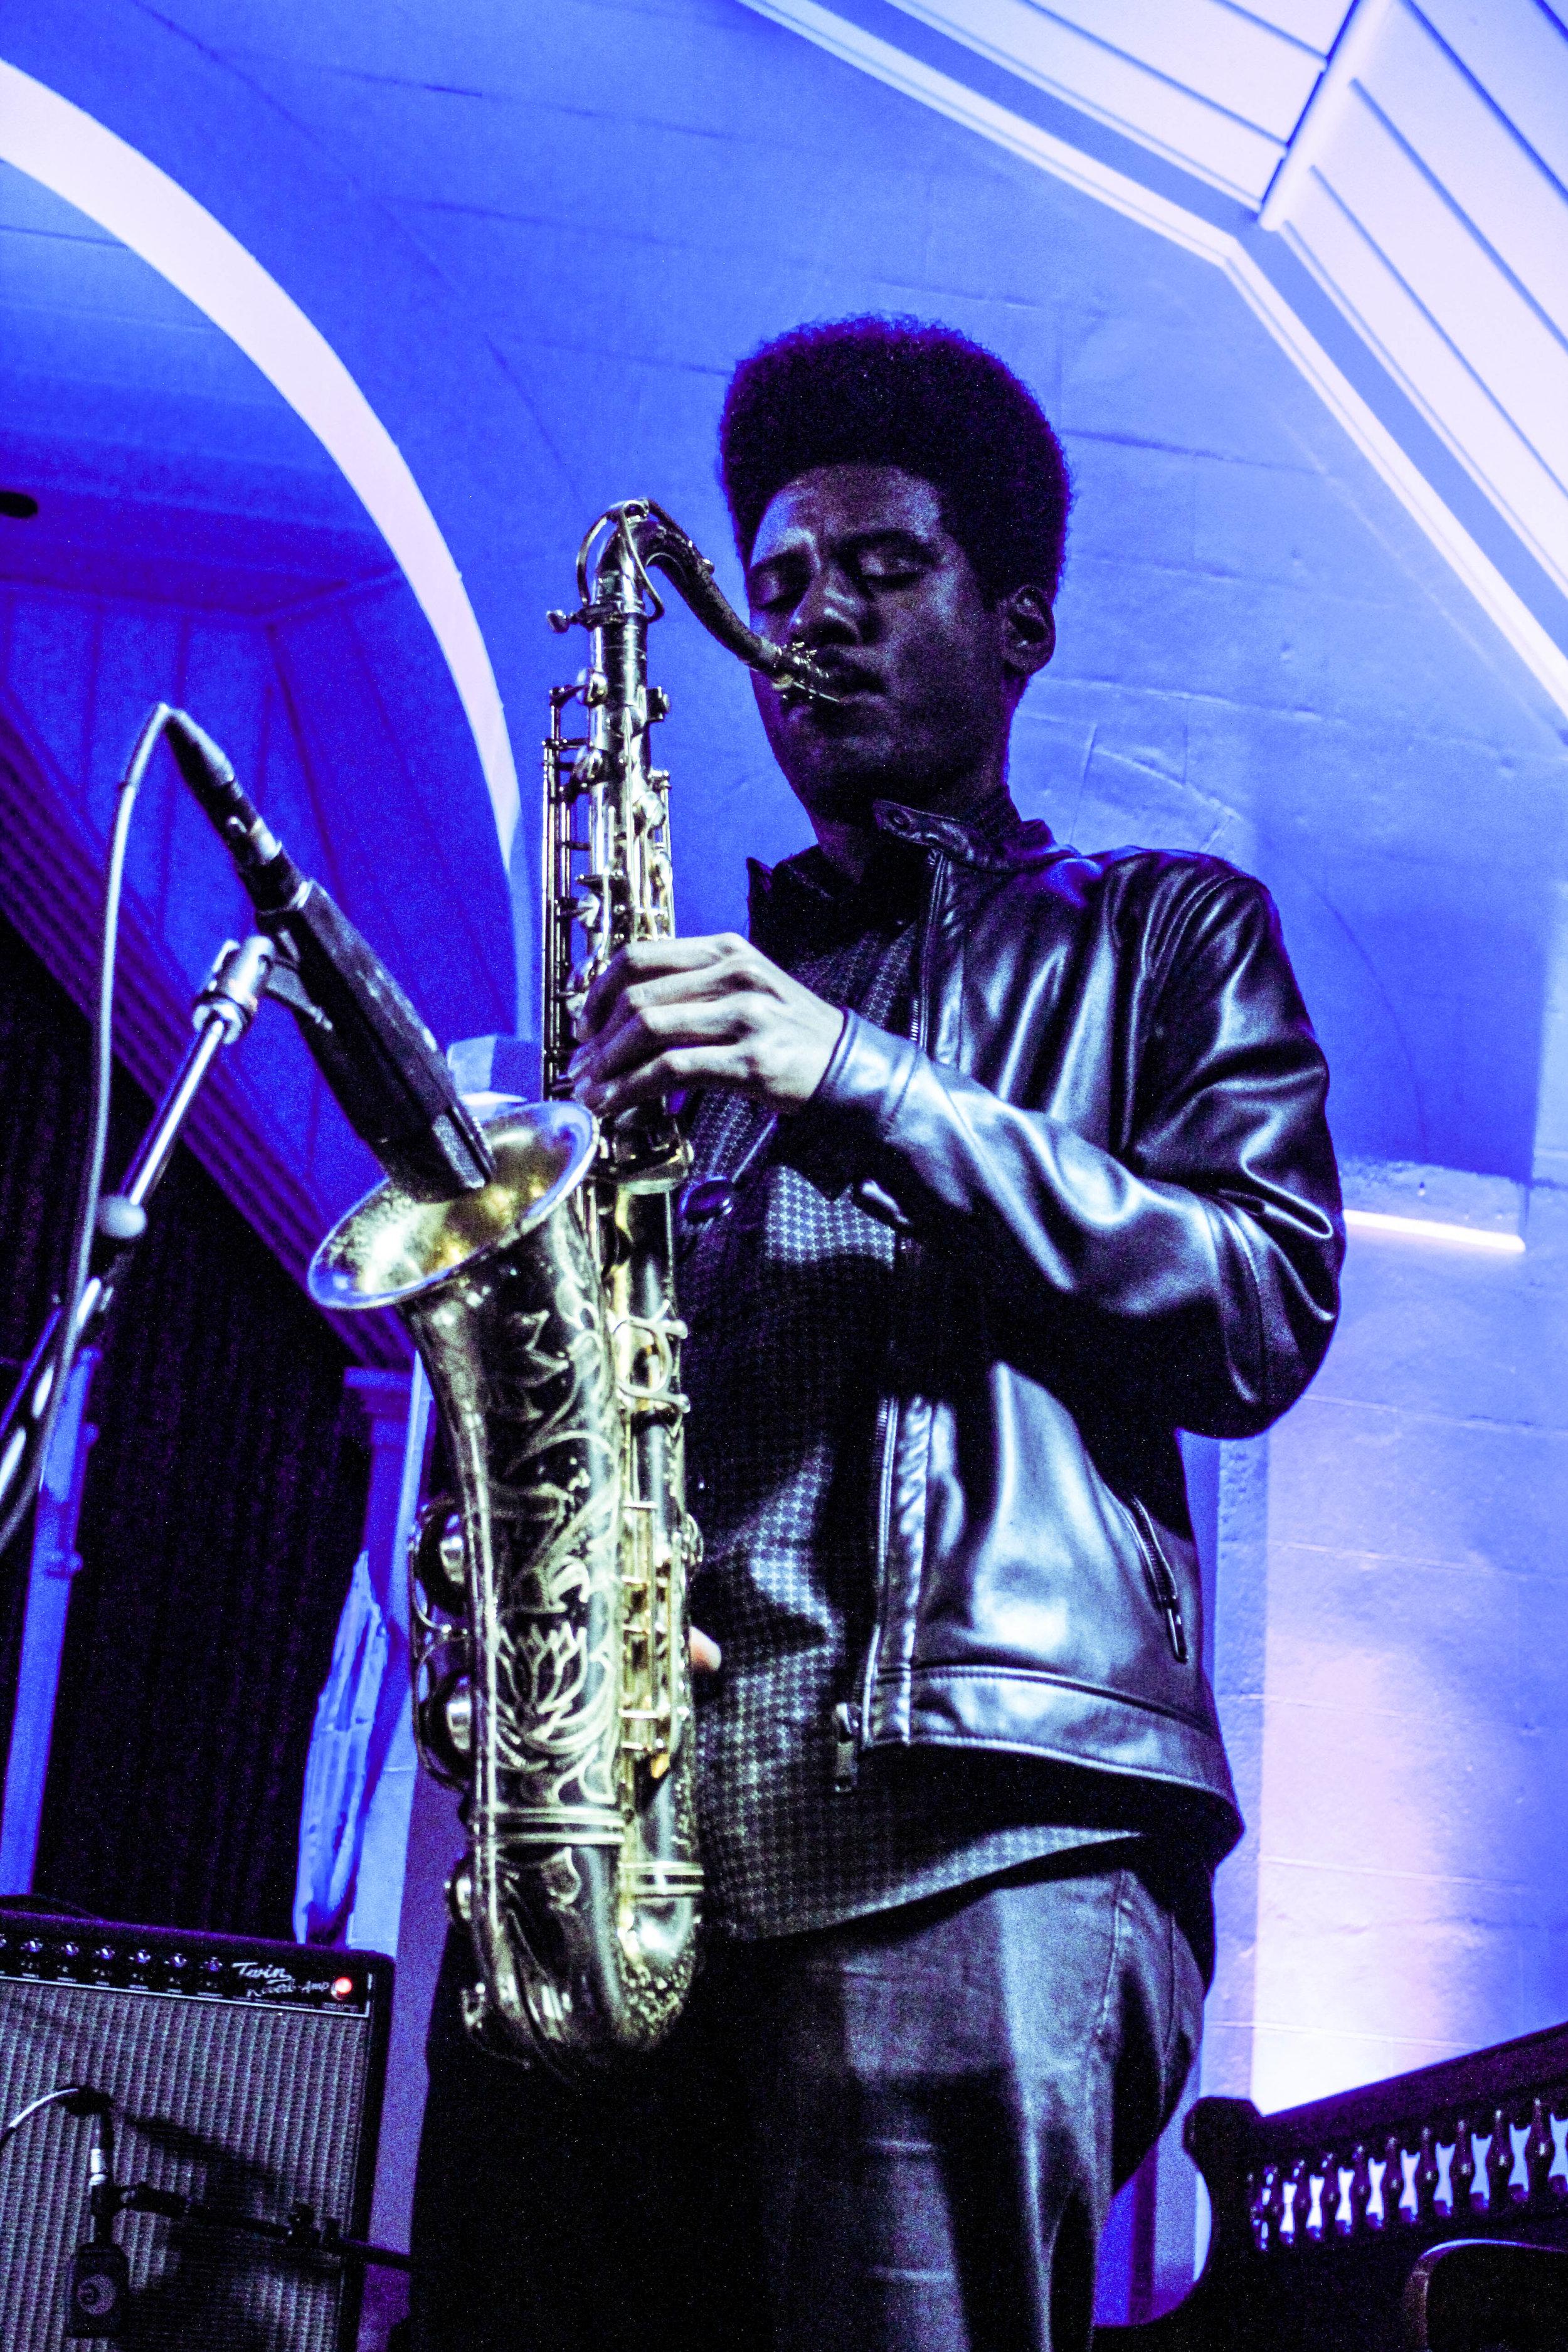 Photo © Concentus Music - Celeste (Saxophonist) at SXSW